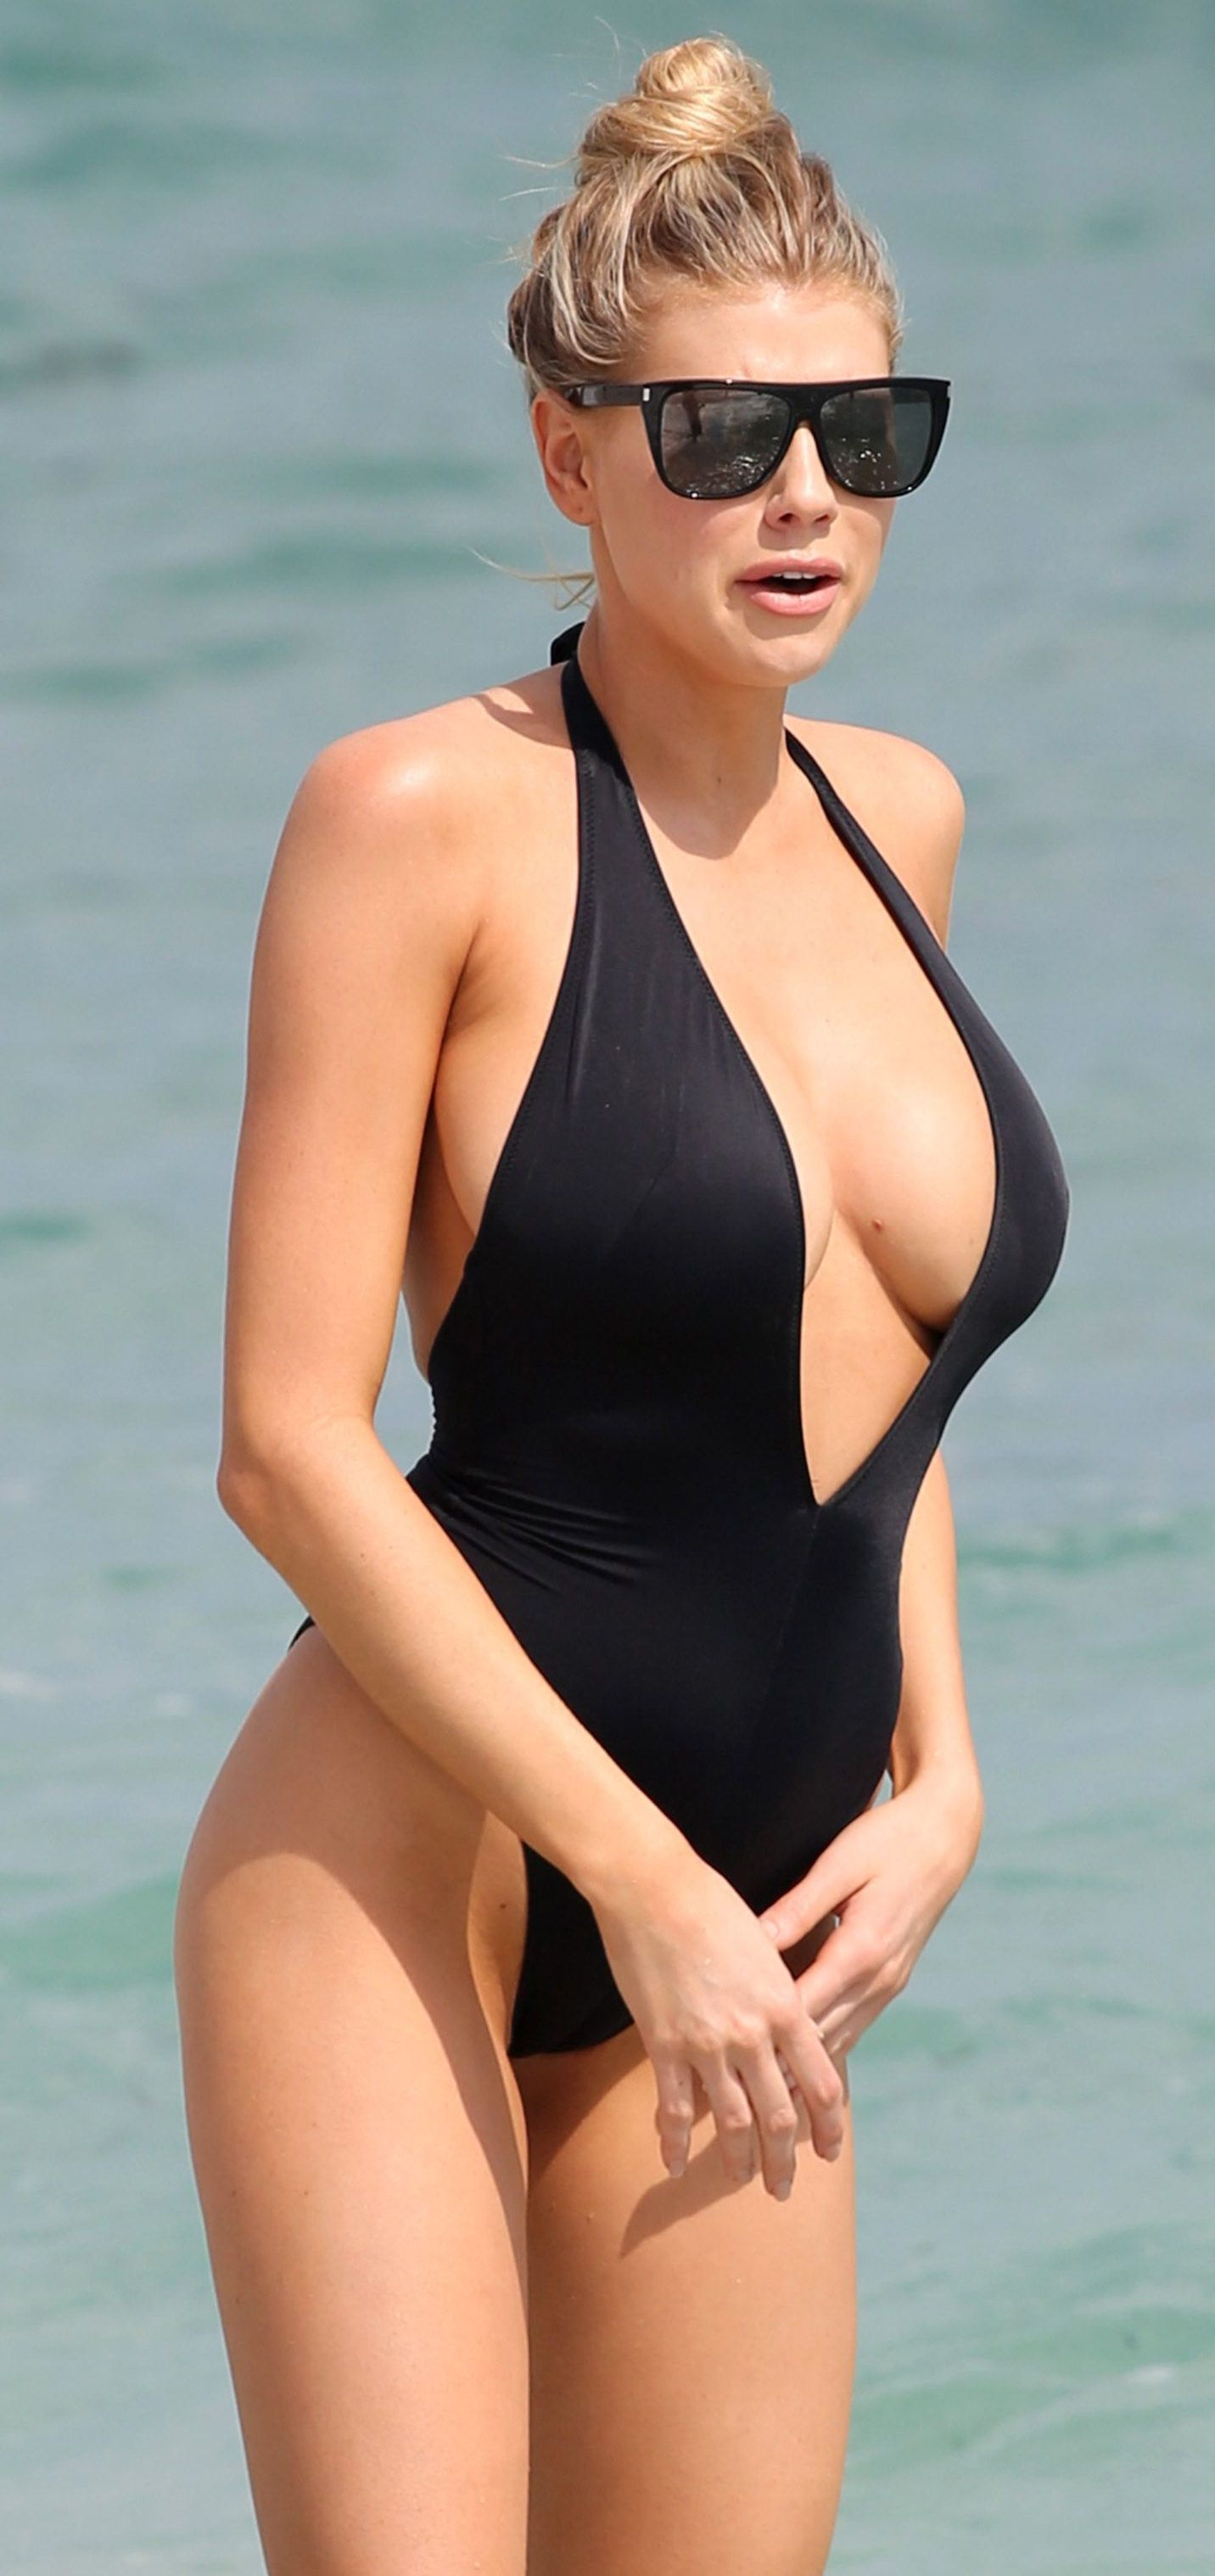 Charlotte mckinney bikini hiding butthole new pics